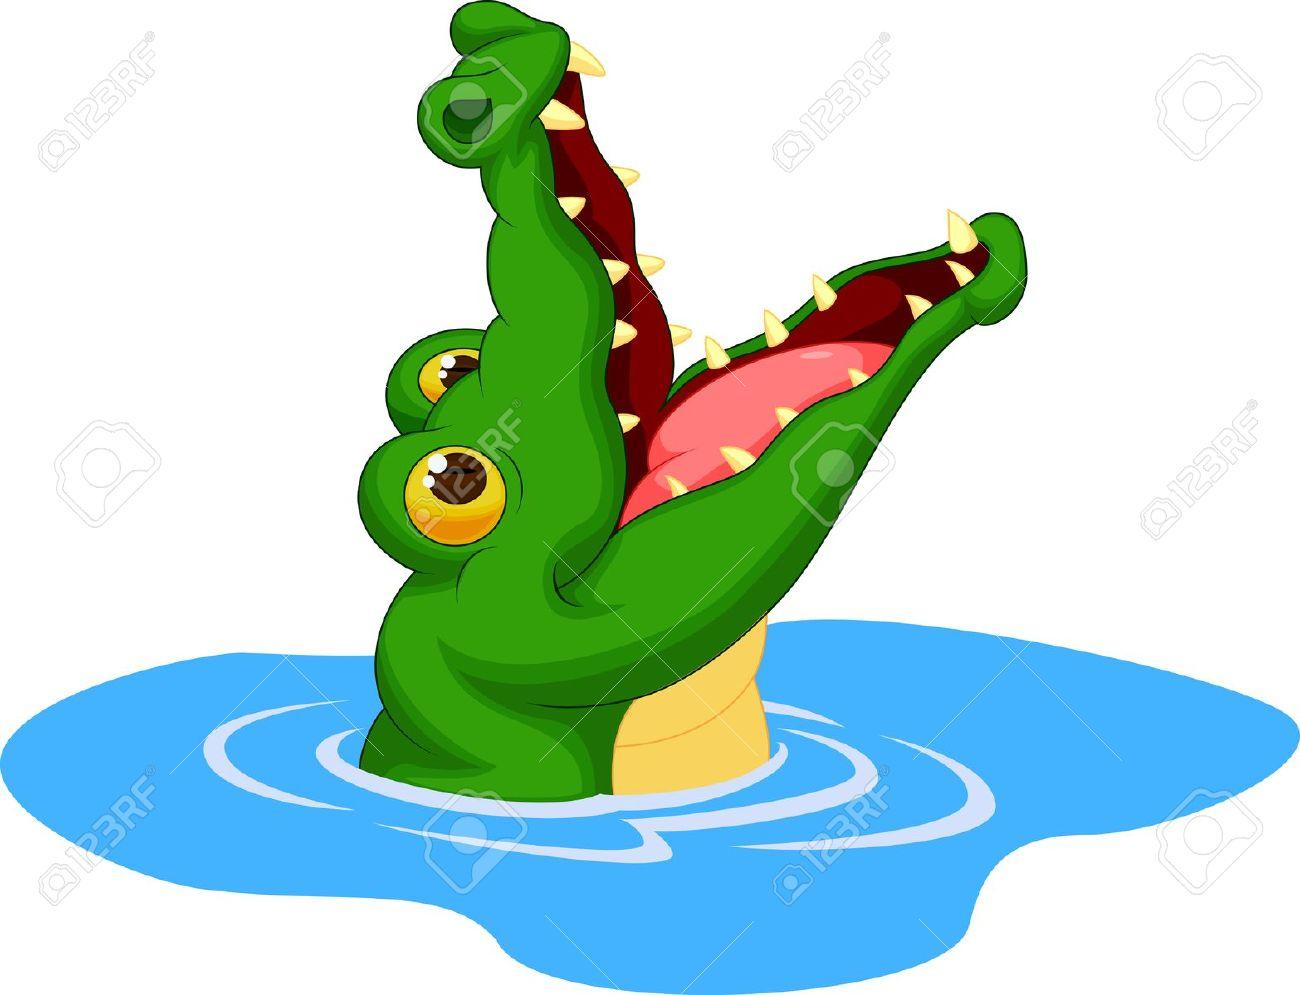 Alligator clipart fish Crocodylia cartoon 294 Vector Crocodile